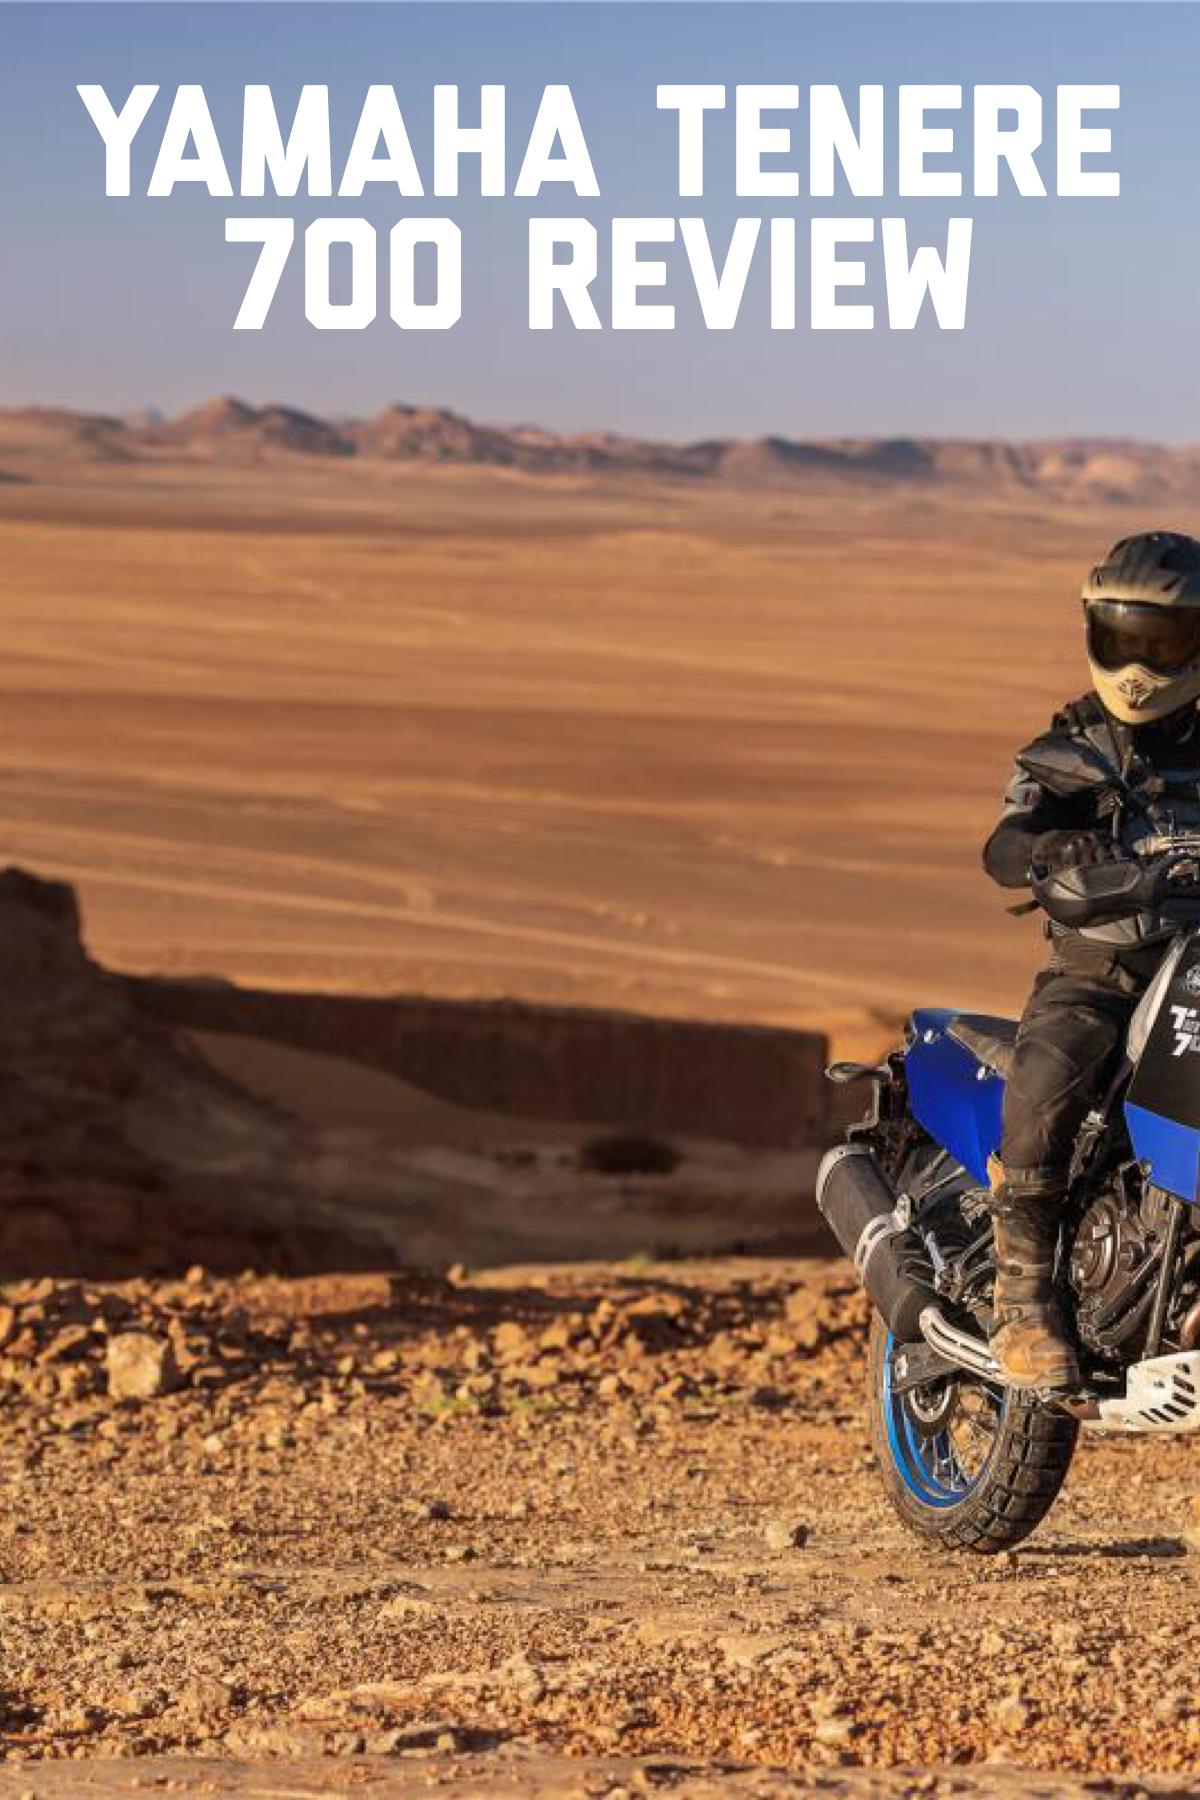 Tenere 700 review